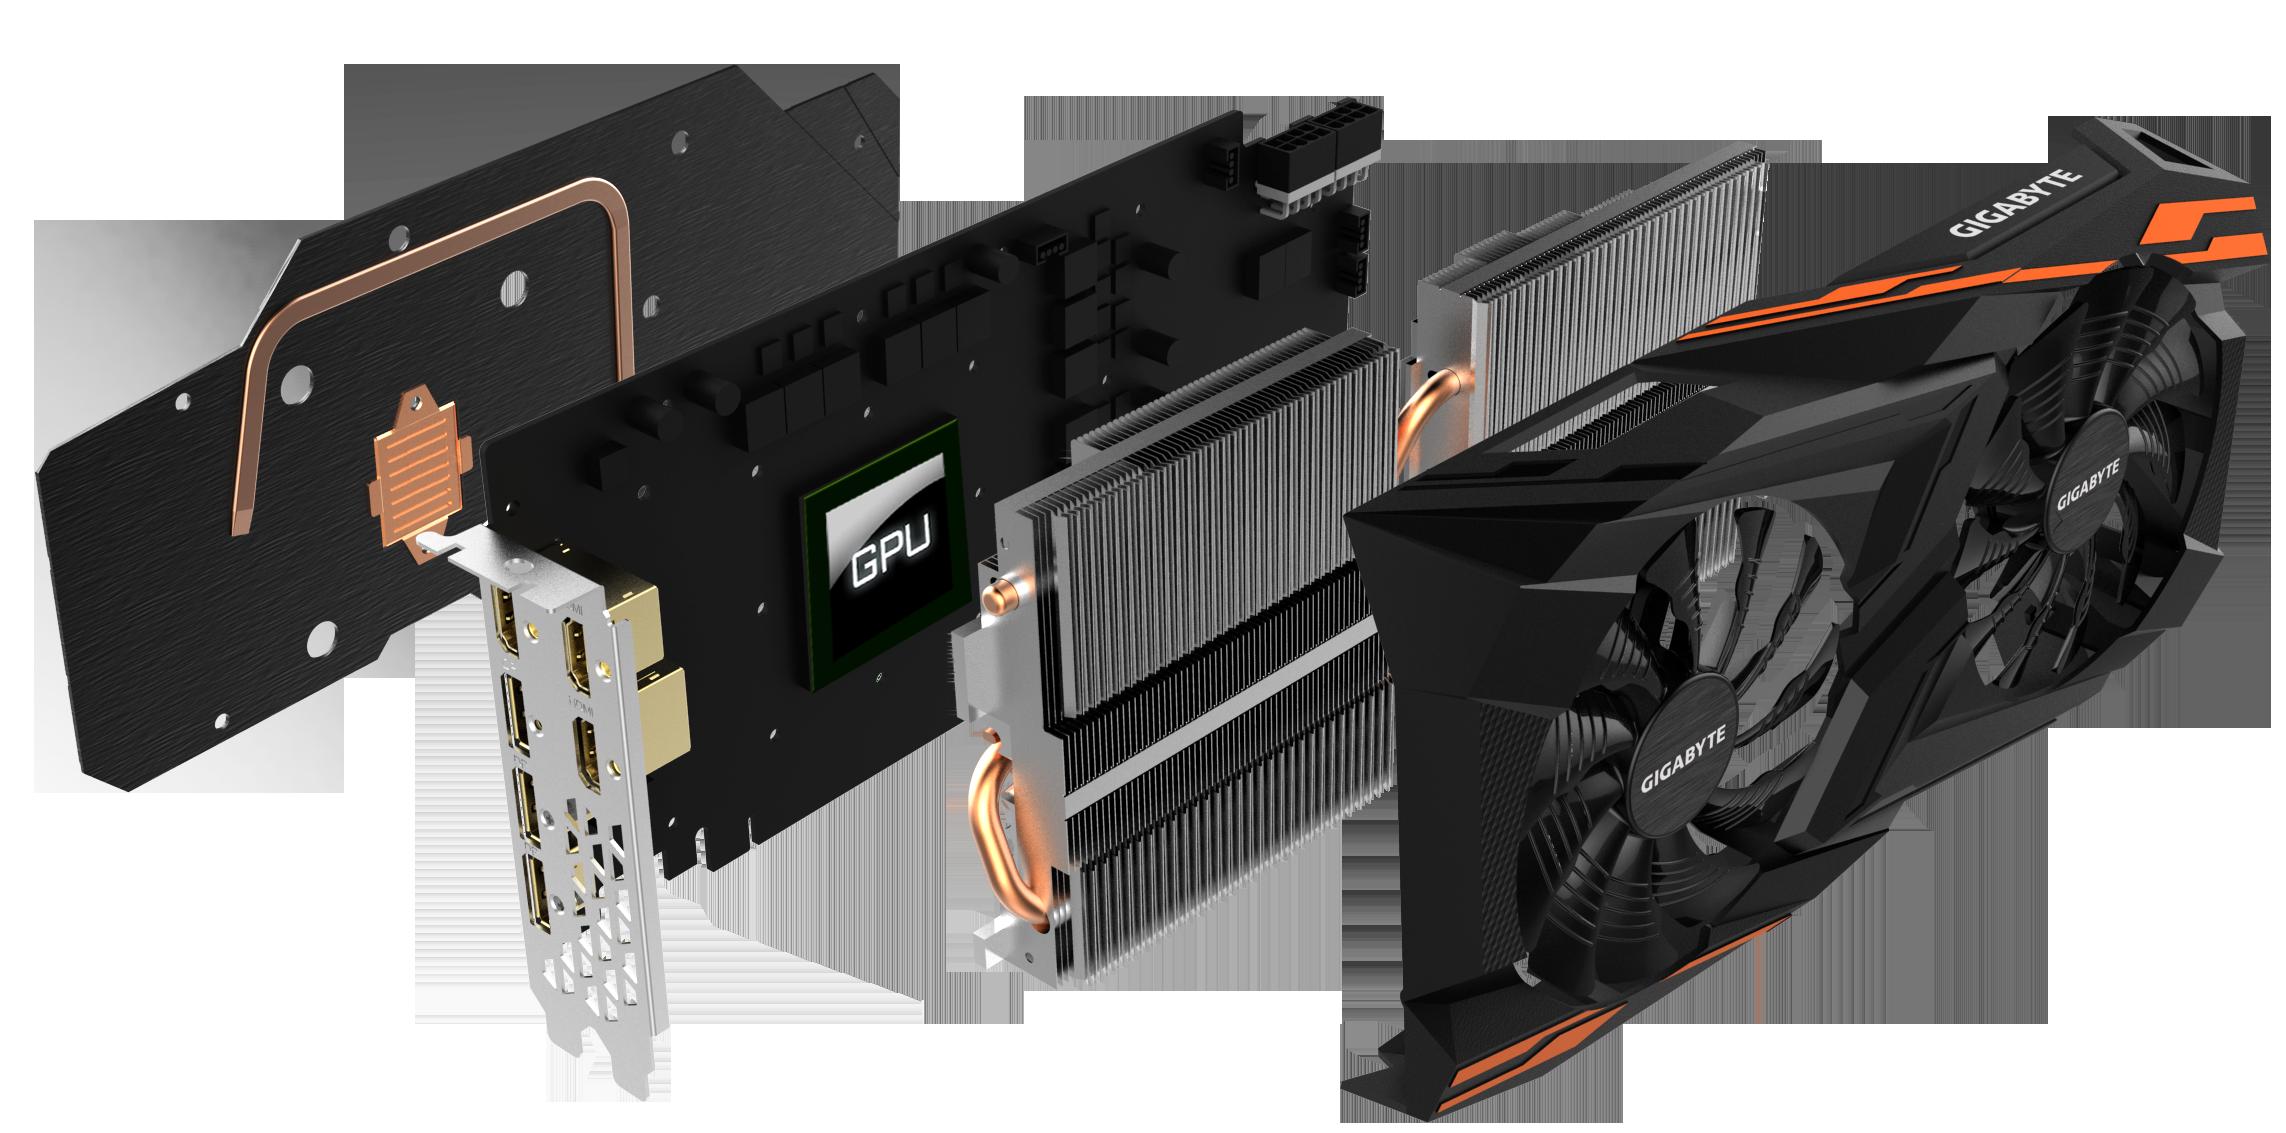 Gigabyte Unveils Radeon Rx Vega 64 Gaming Oc Windforce 2x To Release Rx Vega 56 Version Soon